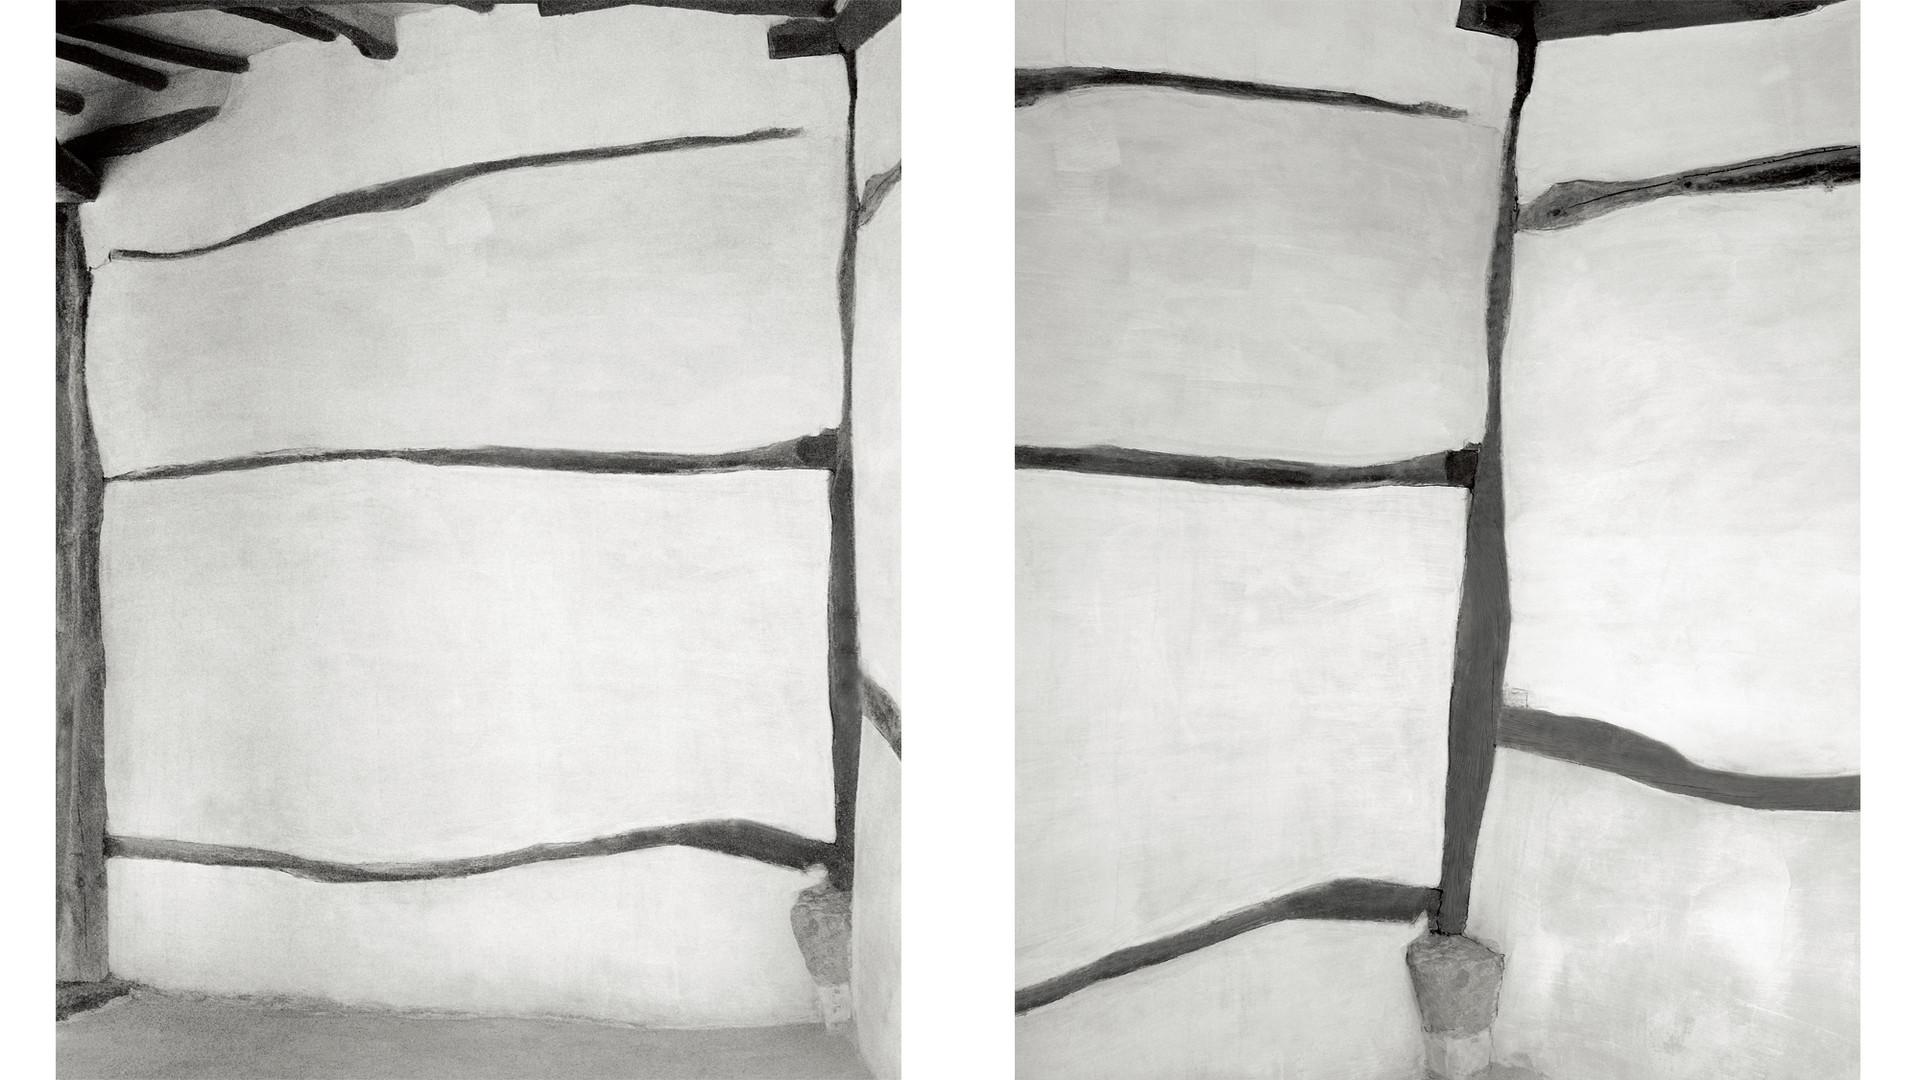 Hanok 0053, 0056, 2016, 79 x 63 cm, archival pigment print, ed. 15